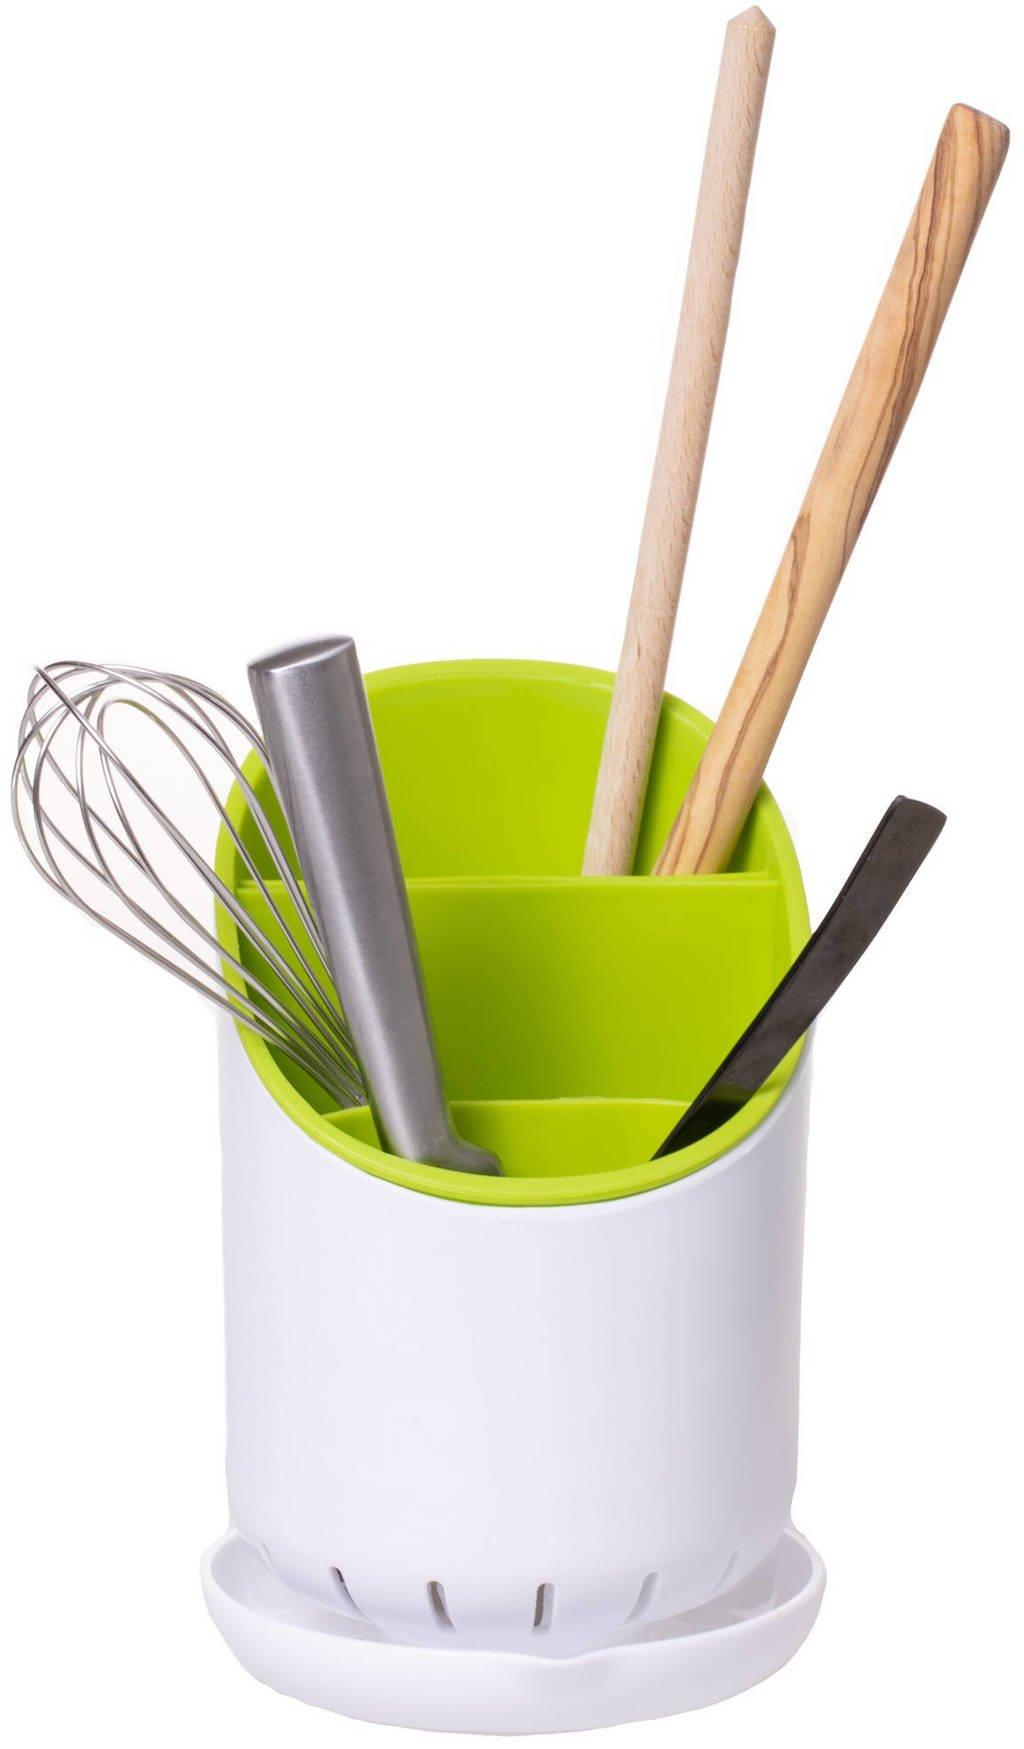 Sareva keukengerei organizer, Groen,Wit